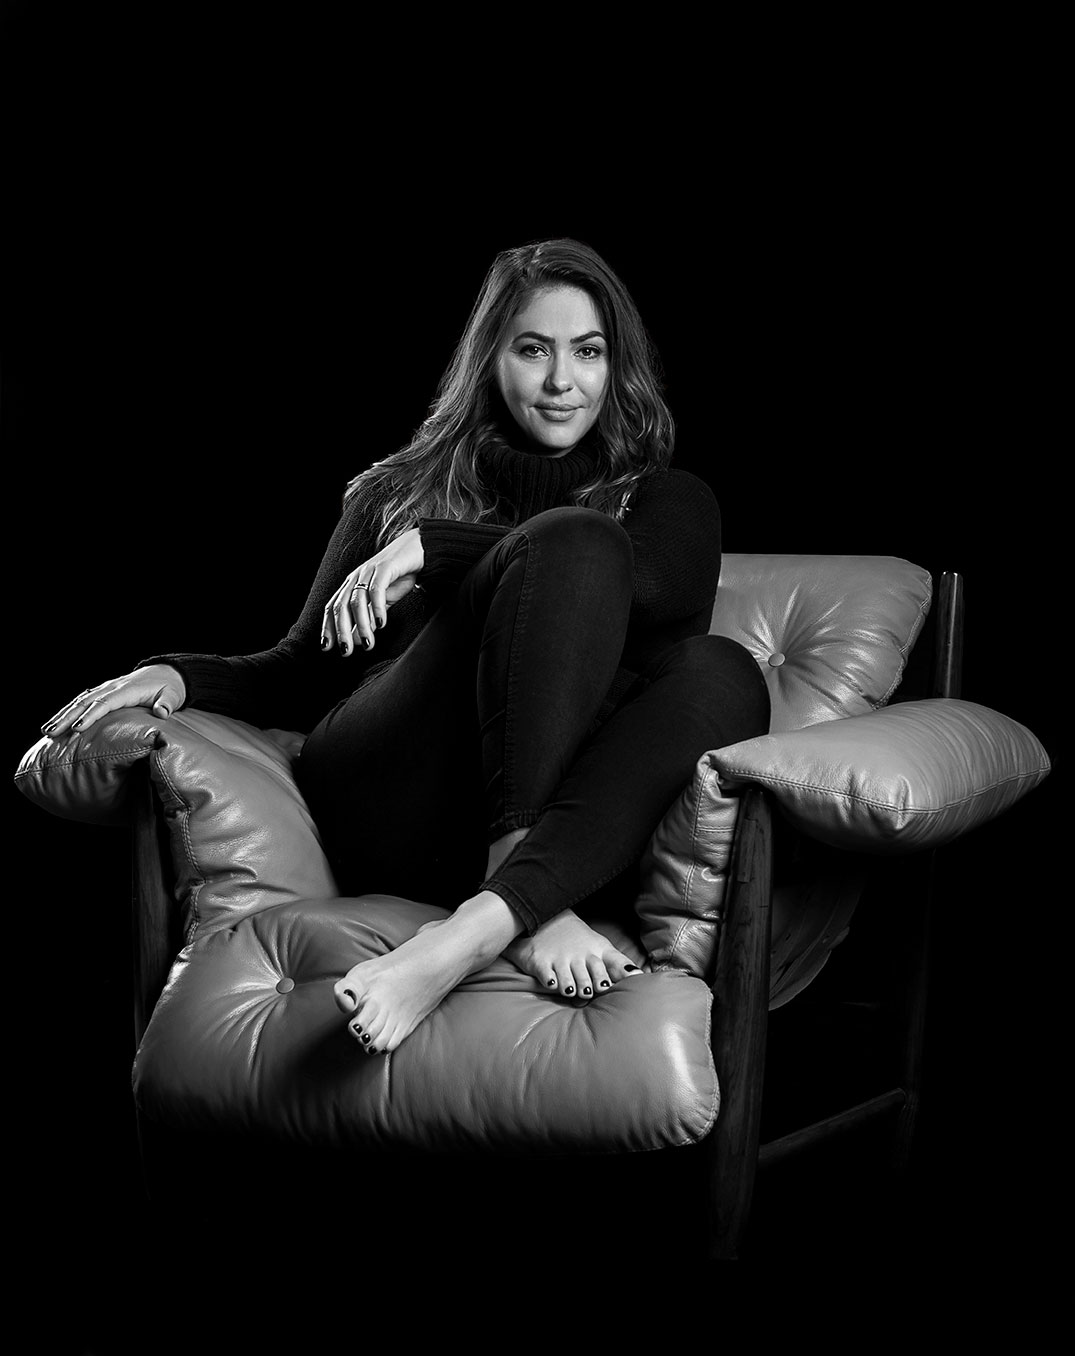 Jessica's-Profile-Pic_2019_web.jpg